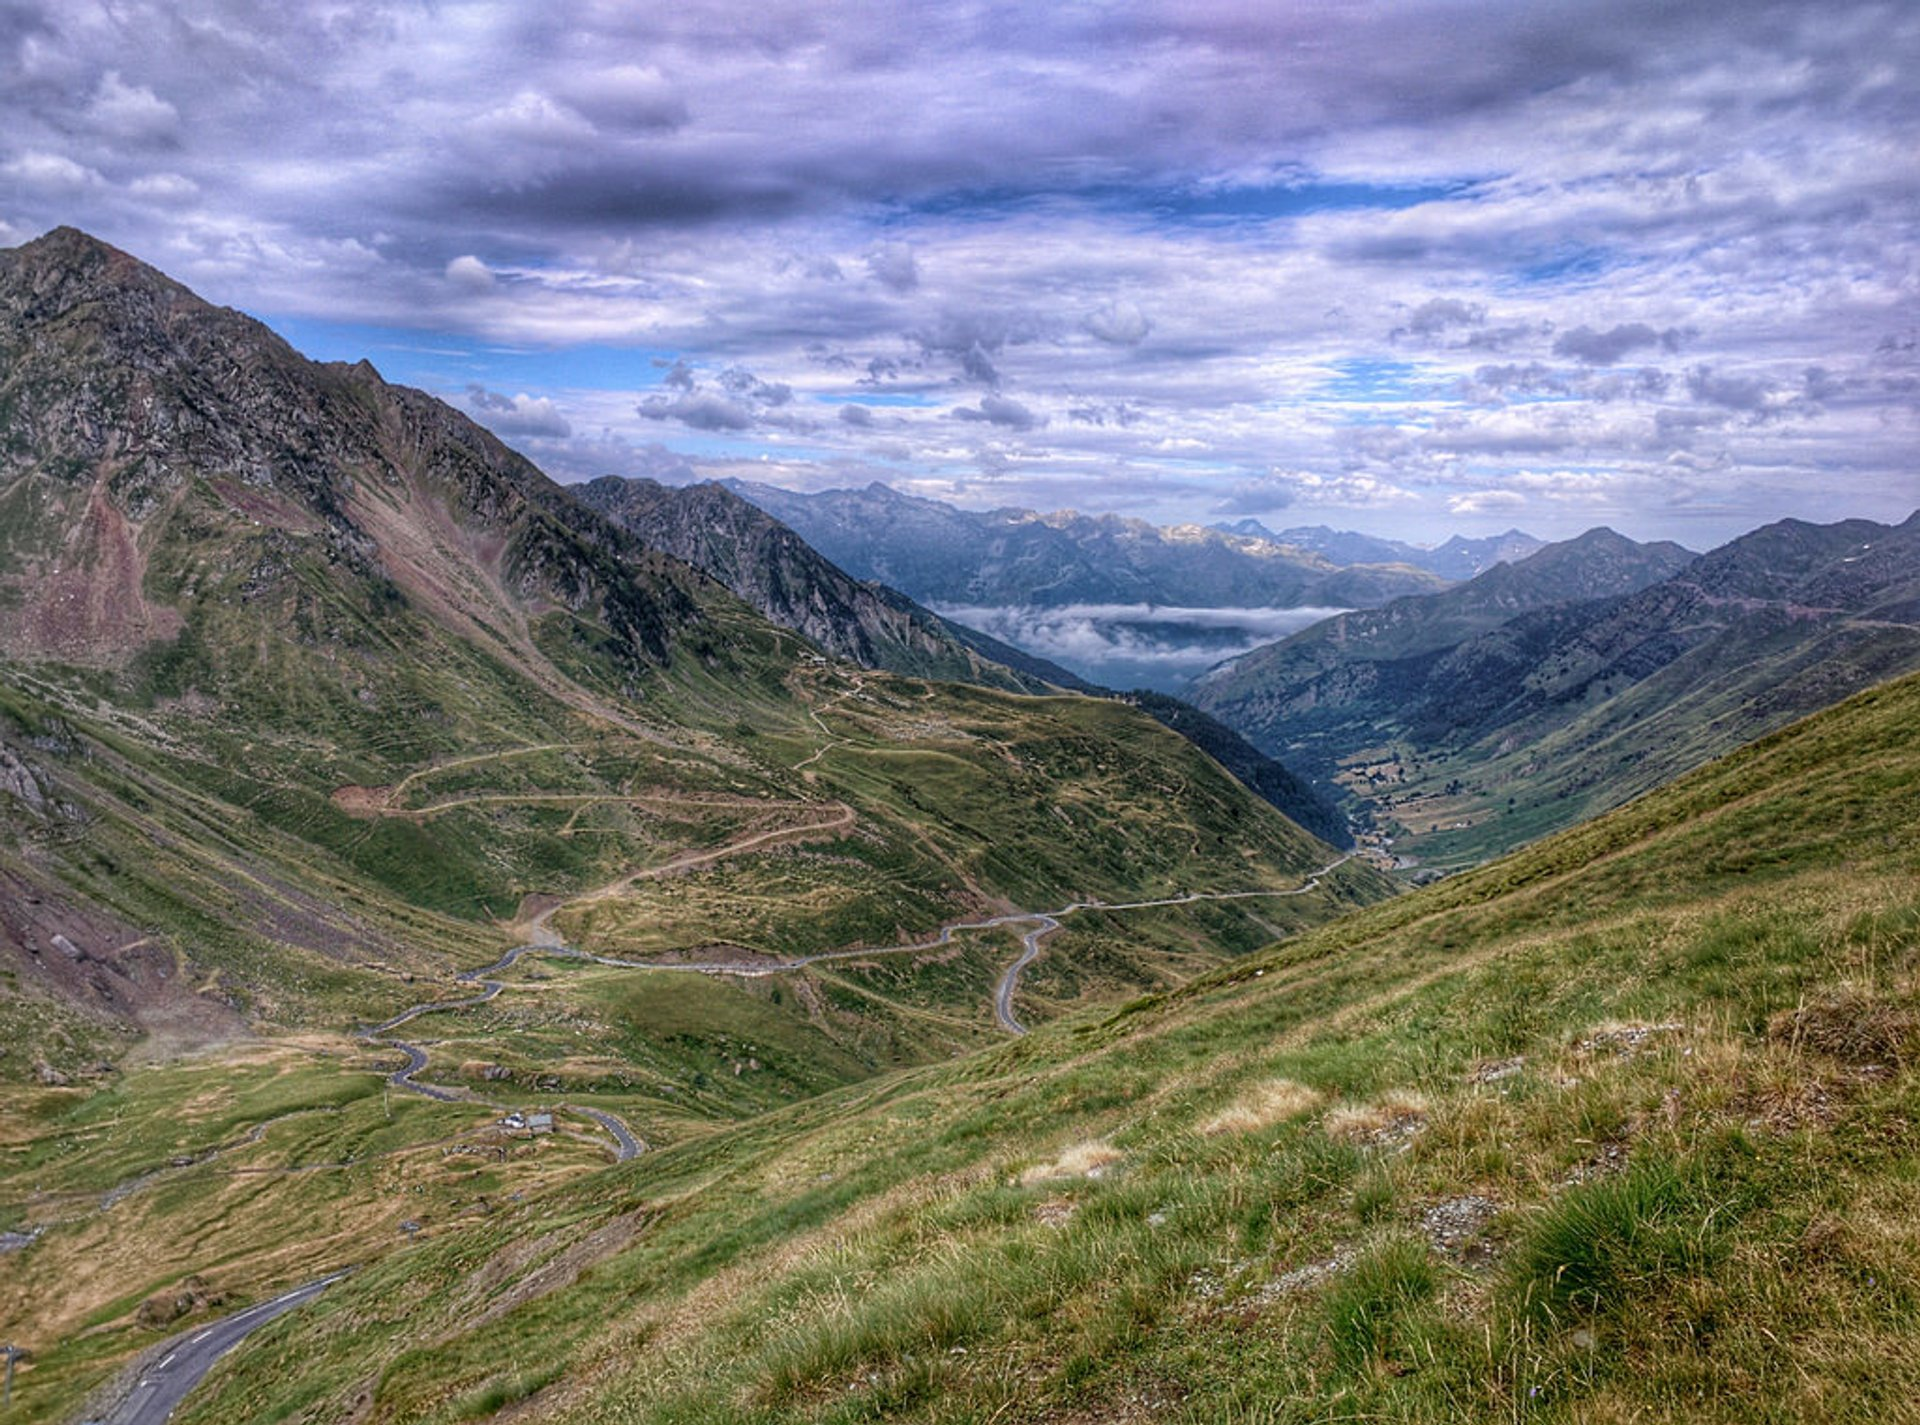 Best time for Col du Tourmalet in France 2020